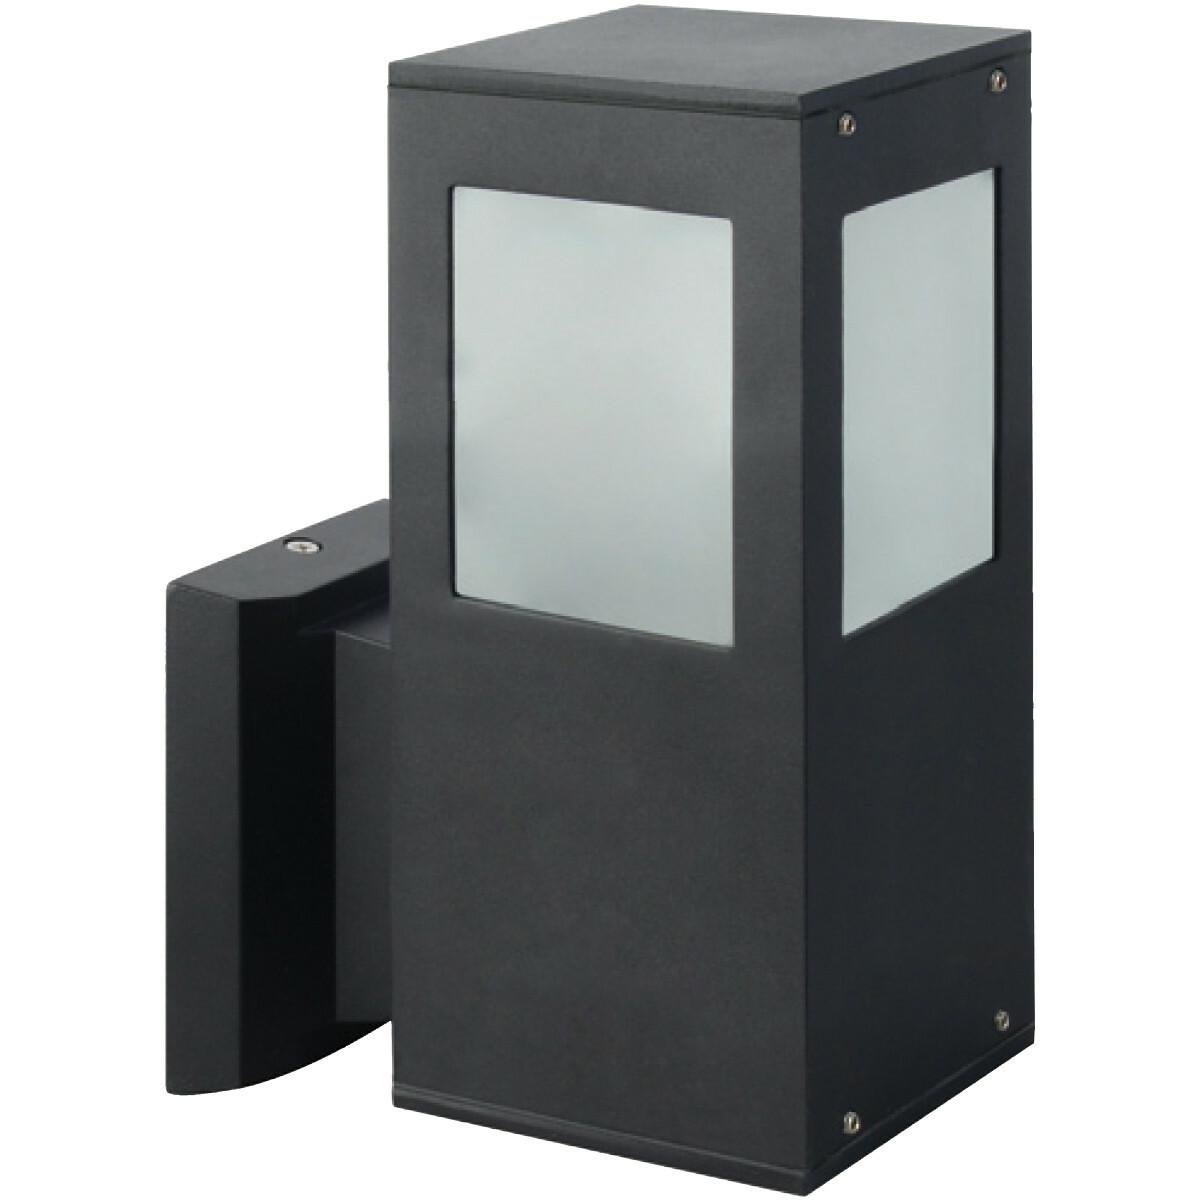 PHILIPS - LED Tuinverlichting - Wandlamp Buiten - SceneSwitch 827 A60 - Kavy 2 - E27 Fitting - Dimba